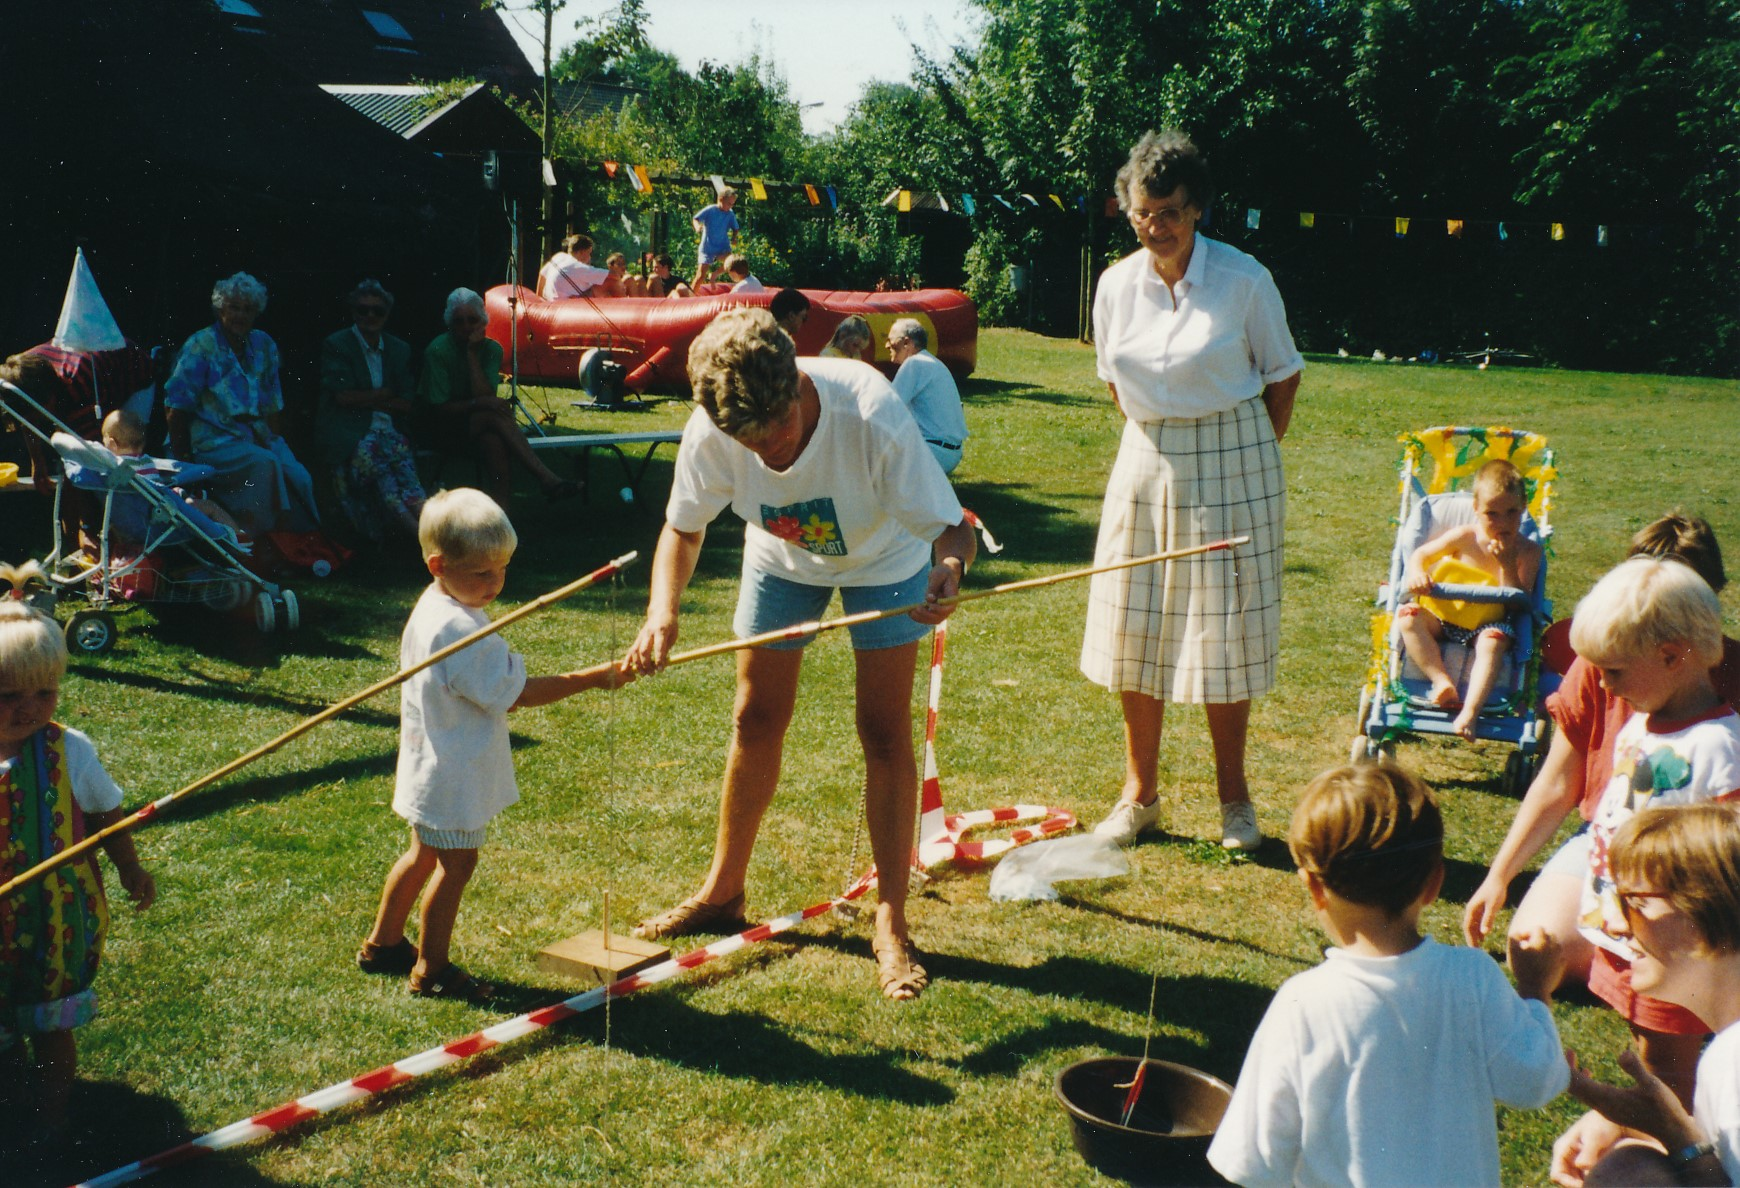 Fotoalbum Anneke Miedema, 005, Merke 1997, augustus, Wieke Brandenburgh, Ria bouhuis, Riek Altenburg